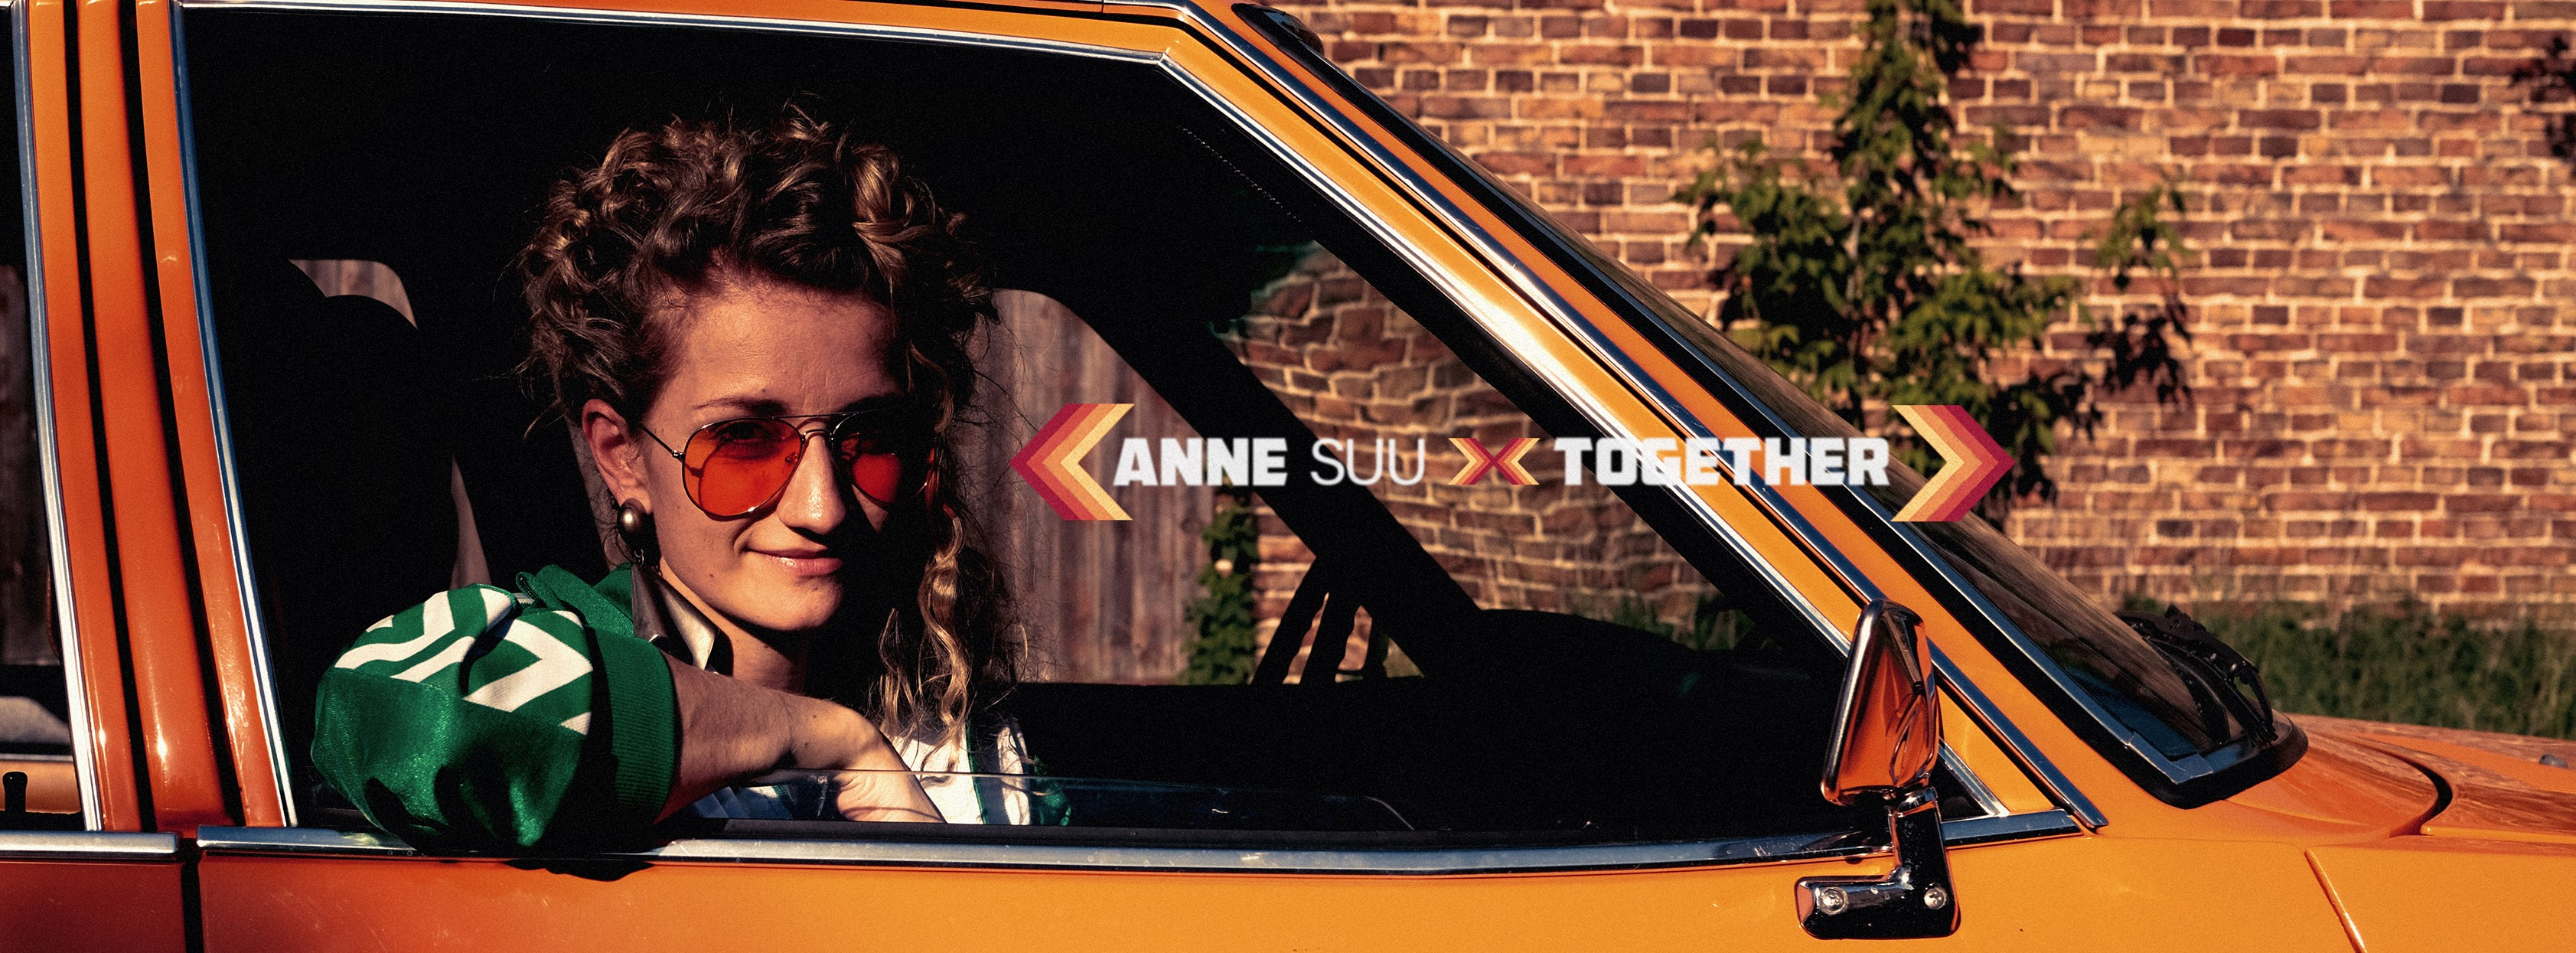 Videopremiere: ANNE SUU X B-SIDE - TOGETHER  (Blogrebellen Premiere)